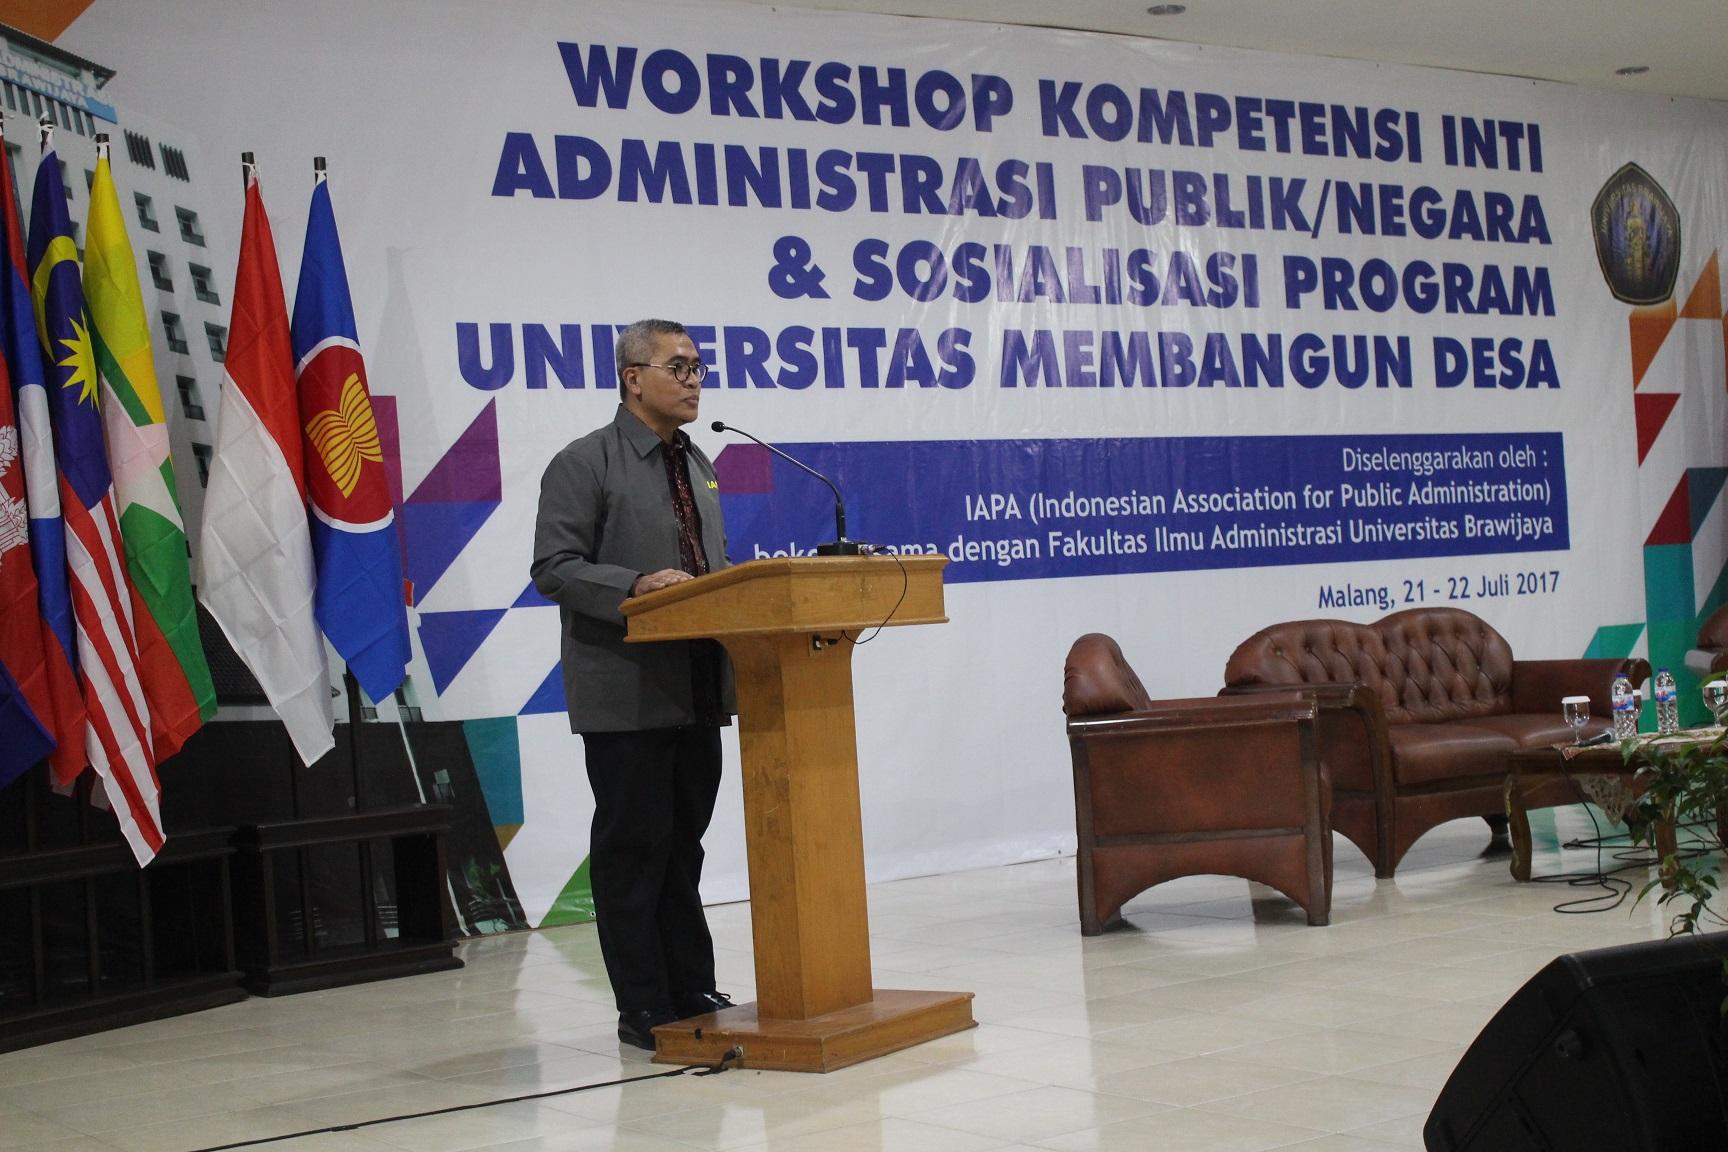 Workshop Kurikulum Inti Administrasi Publik/Negara Se-Indonesia